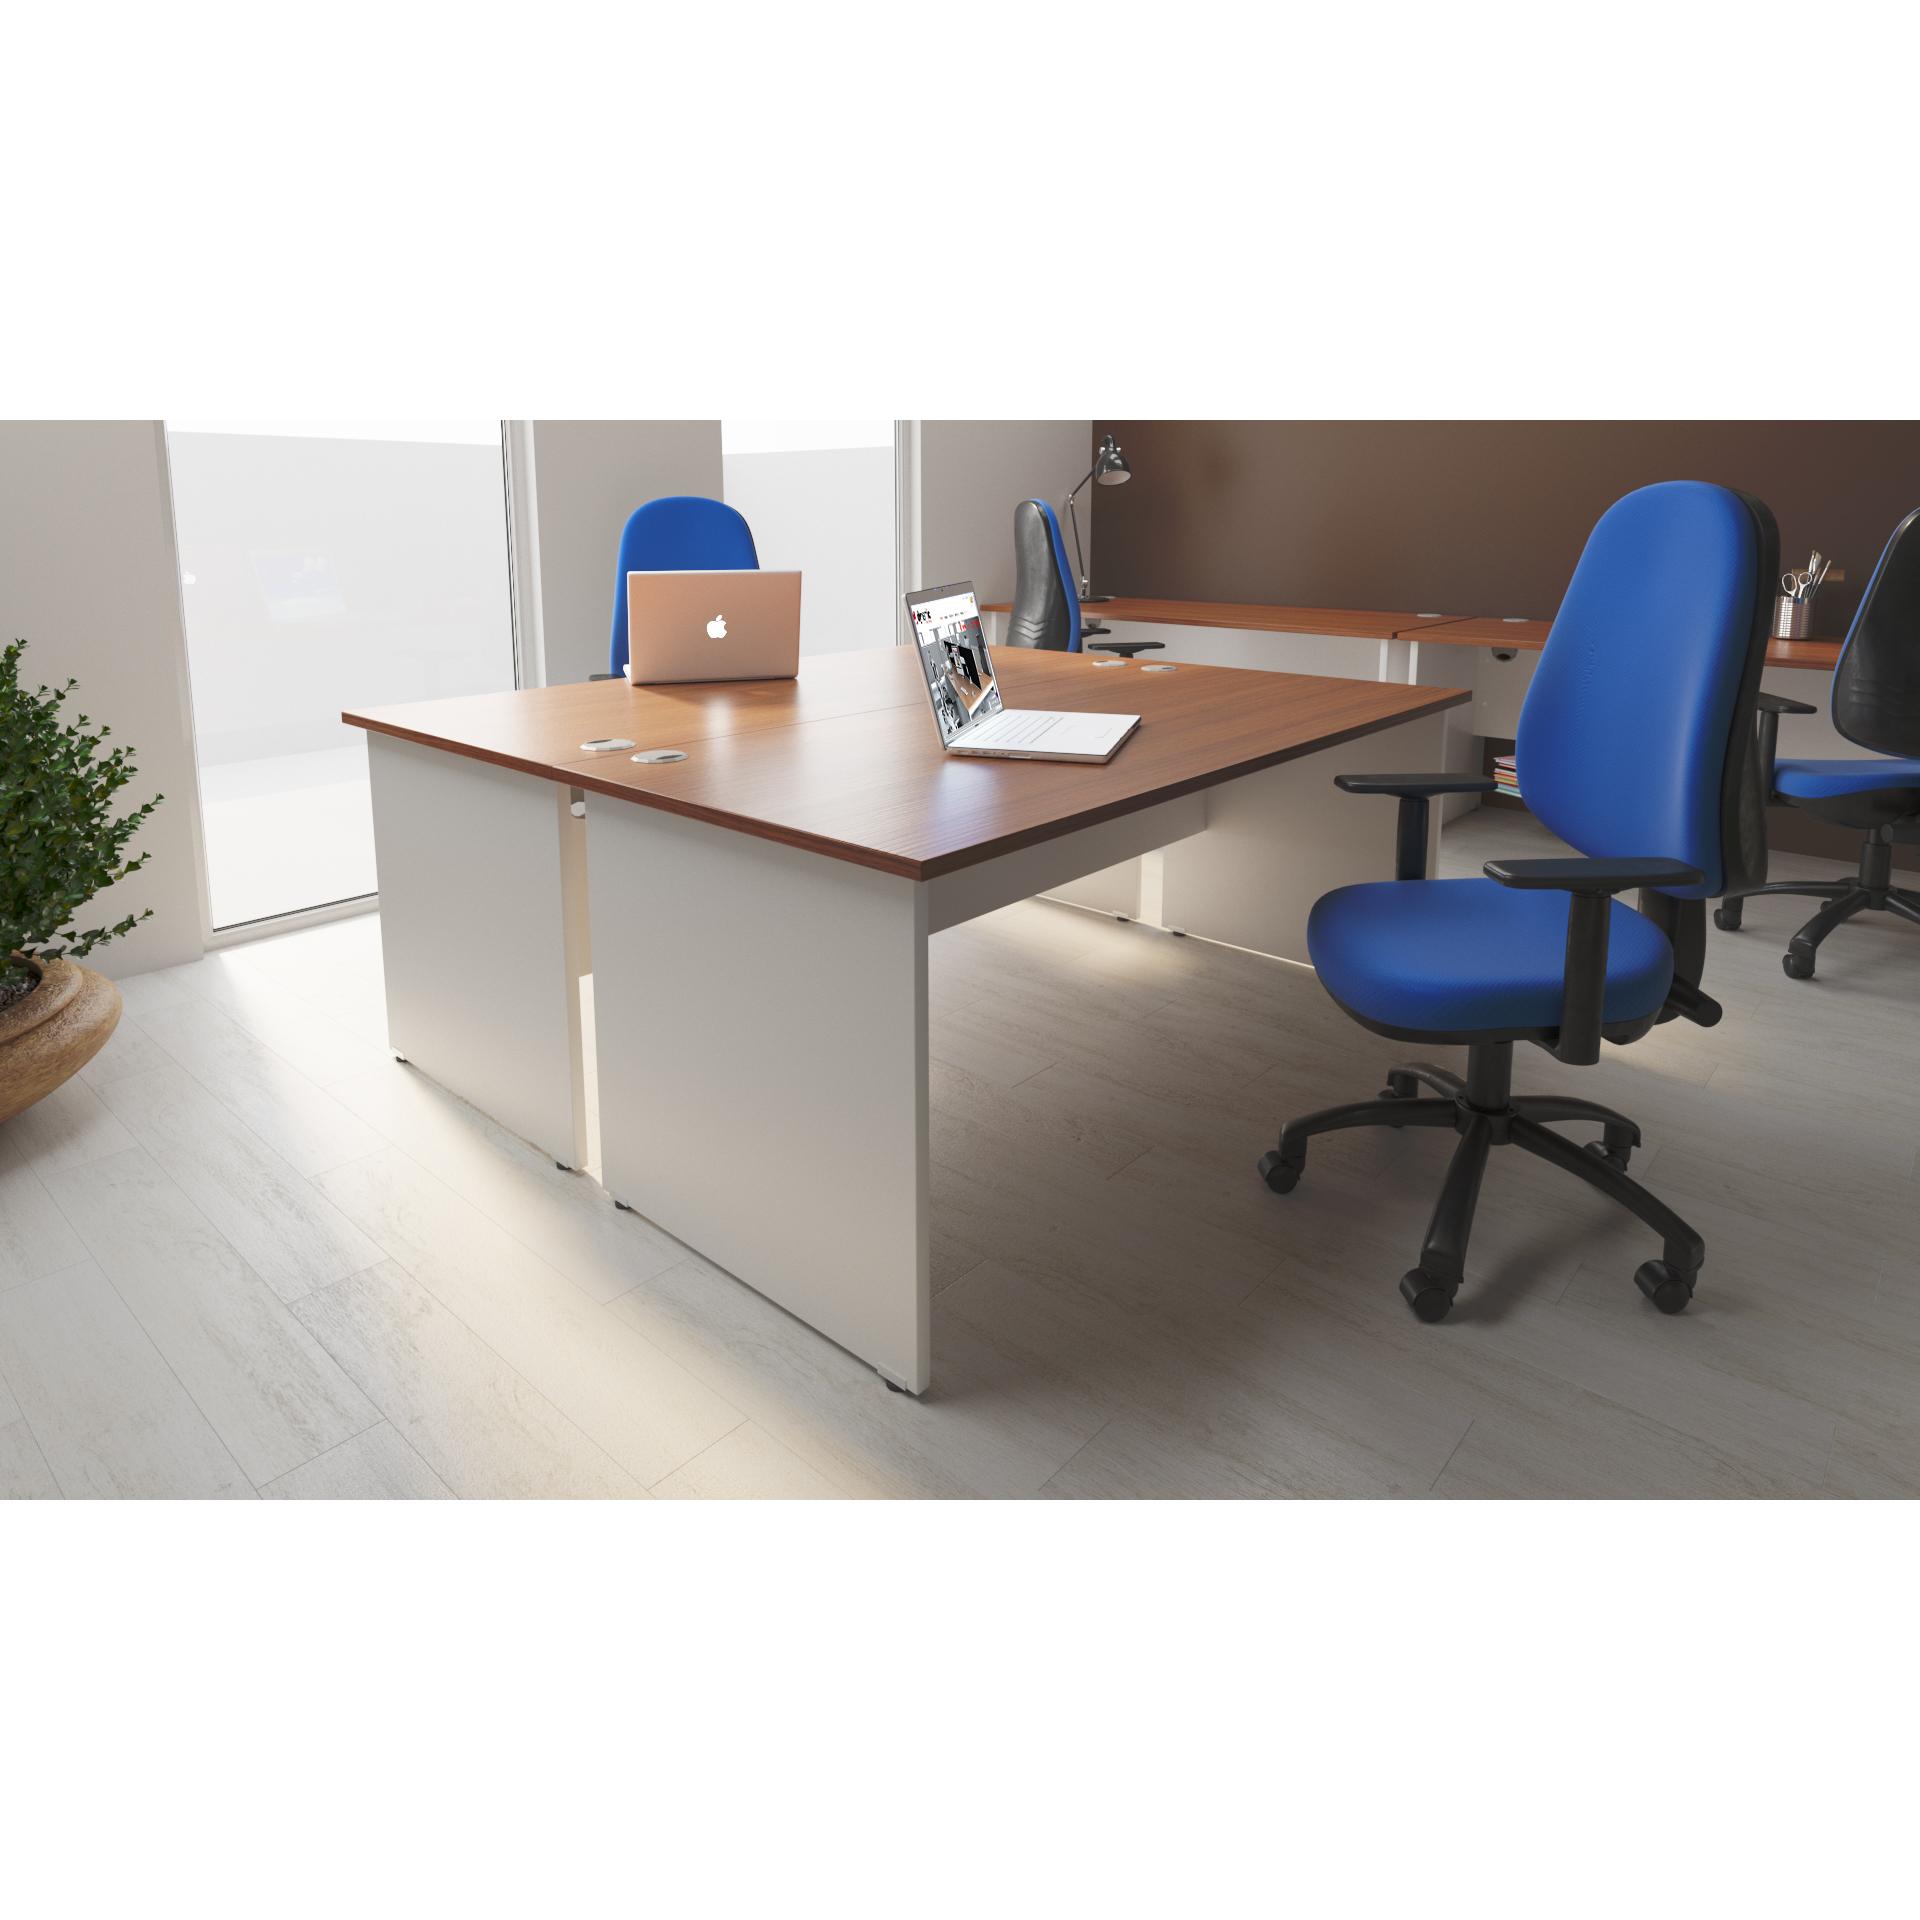 Trexus Desk Rectangle Panel End 800x600mm Walnut Top White Panels Ref TT000073